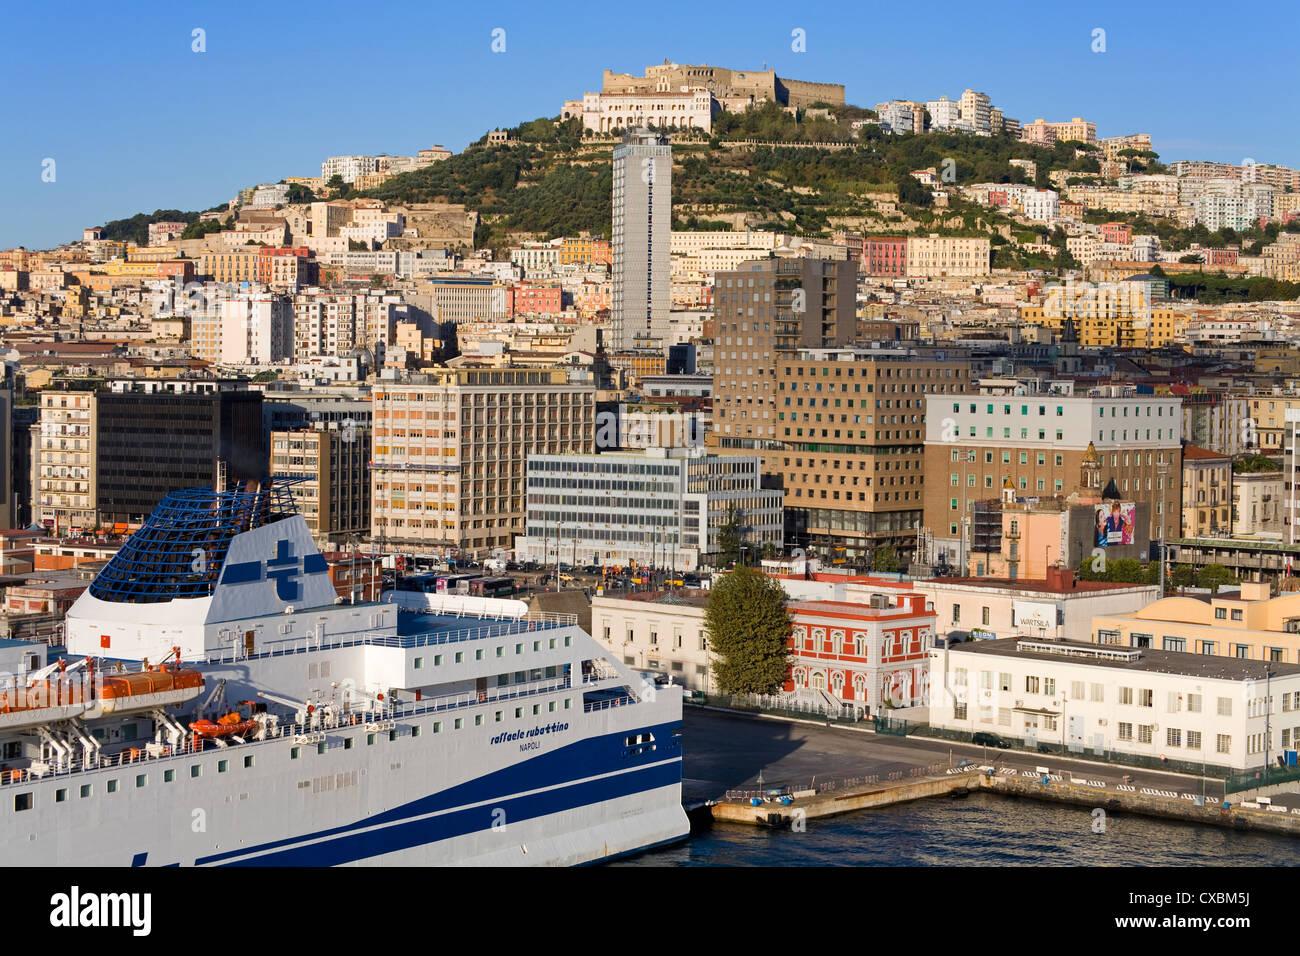 Port of Naples, Campania, Italy, Europe - Stock Image